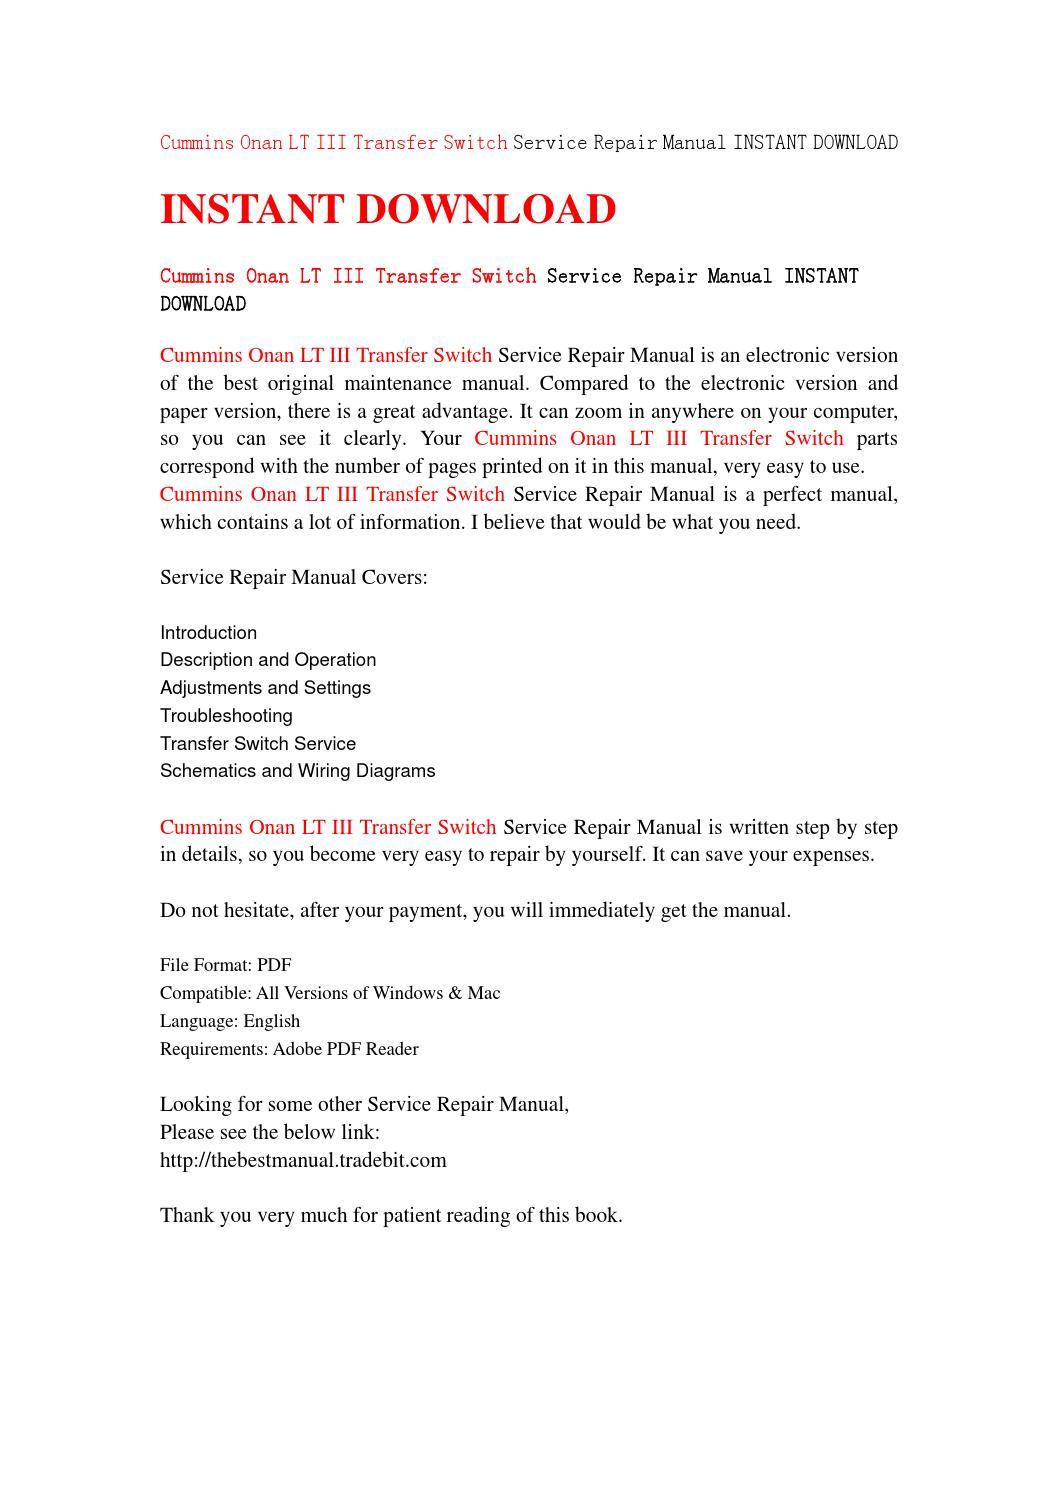 Cummins onan lt iii transfer switch service repair manual instant download  by fsef8uu - issuu